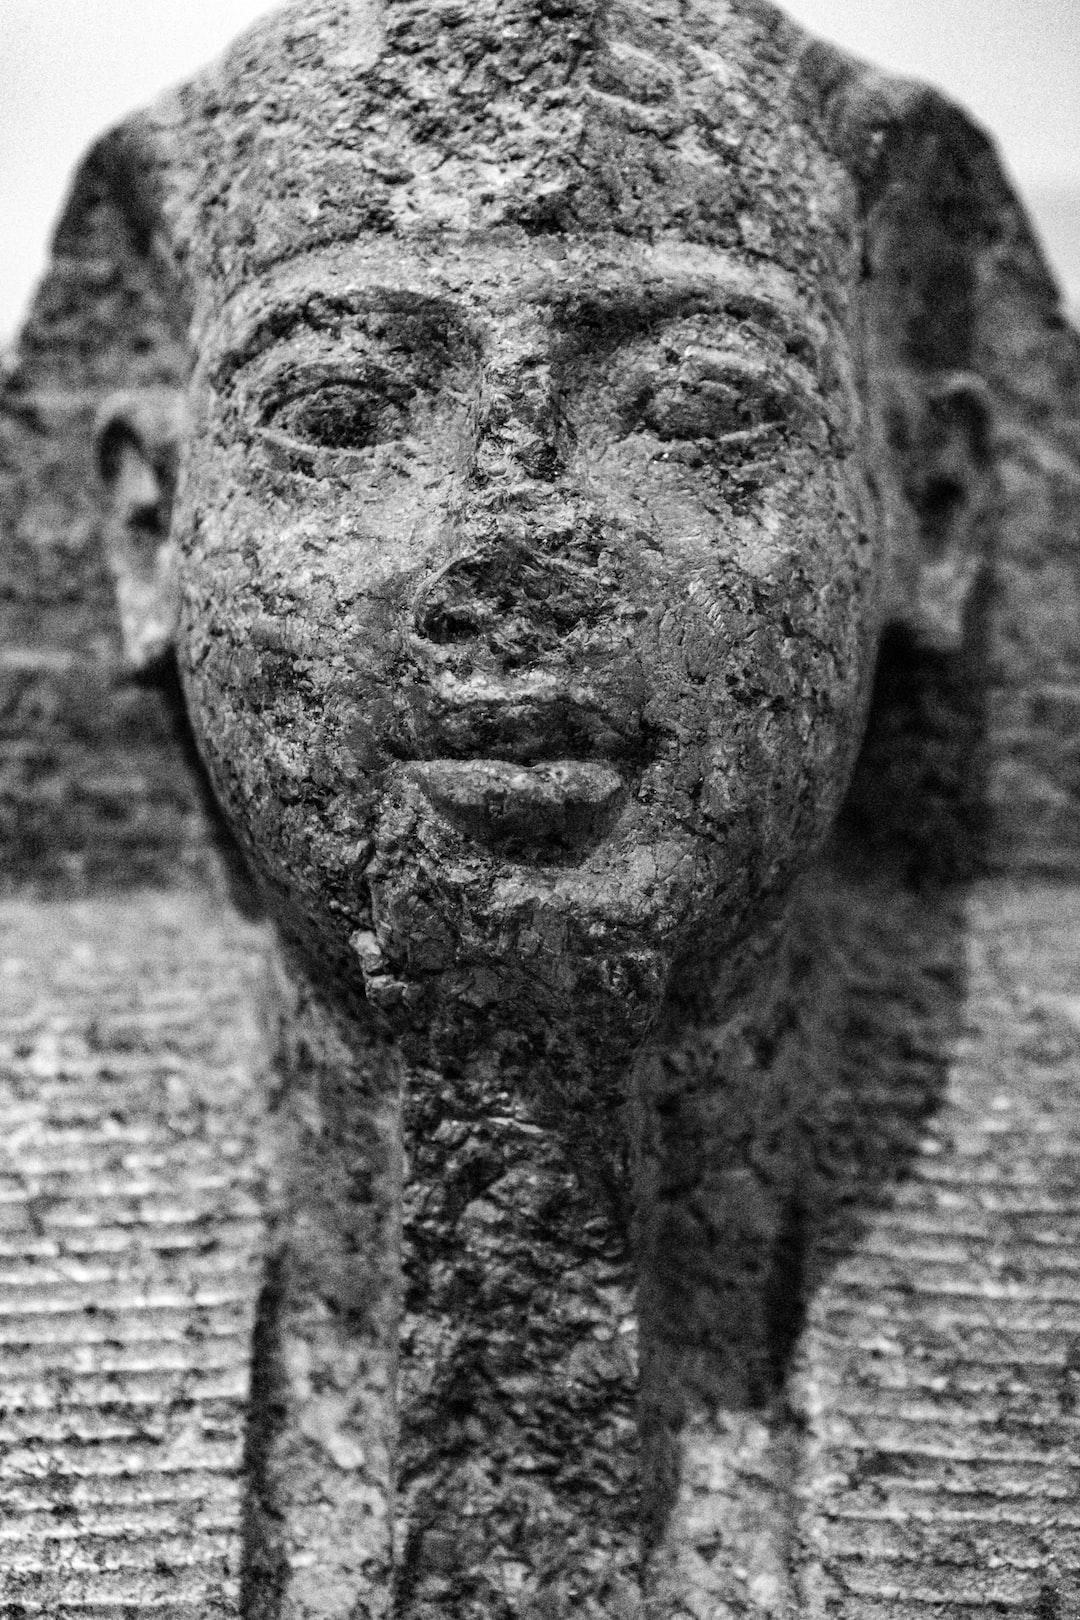 British Museum, London, UK. January 2020. Statue, Egyptian.